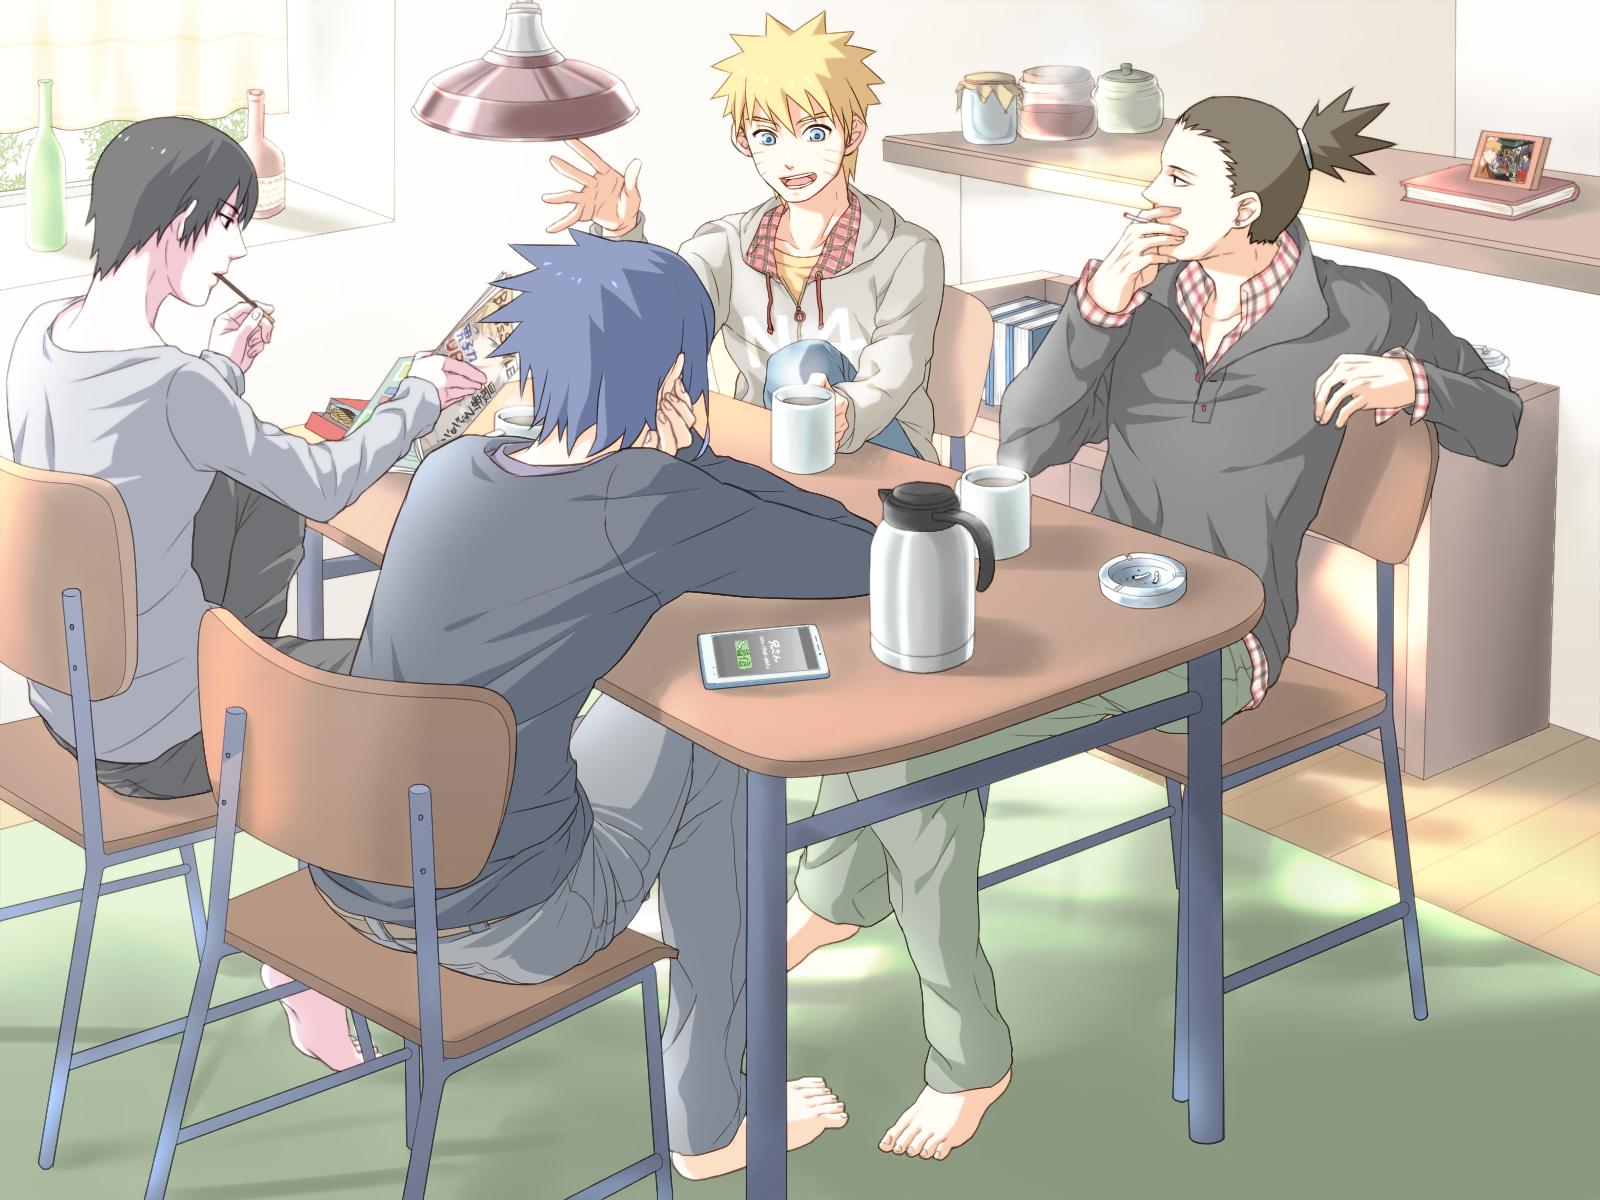 Grown Up Sasuke Ipad Wallpaper Naruto And Sasuke Smoking